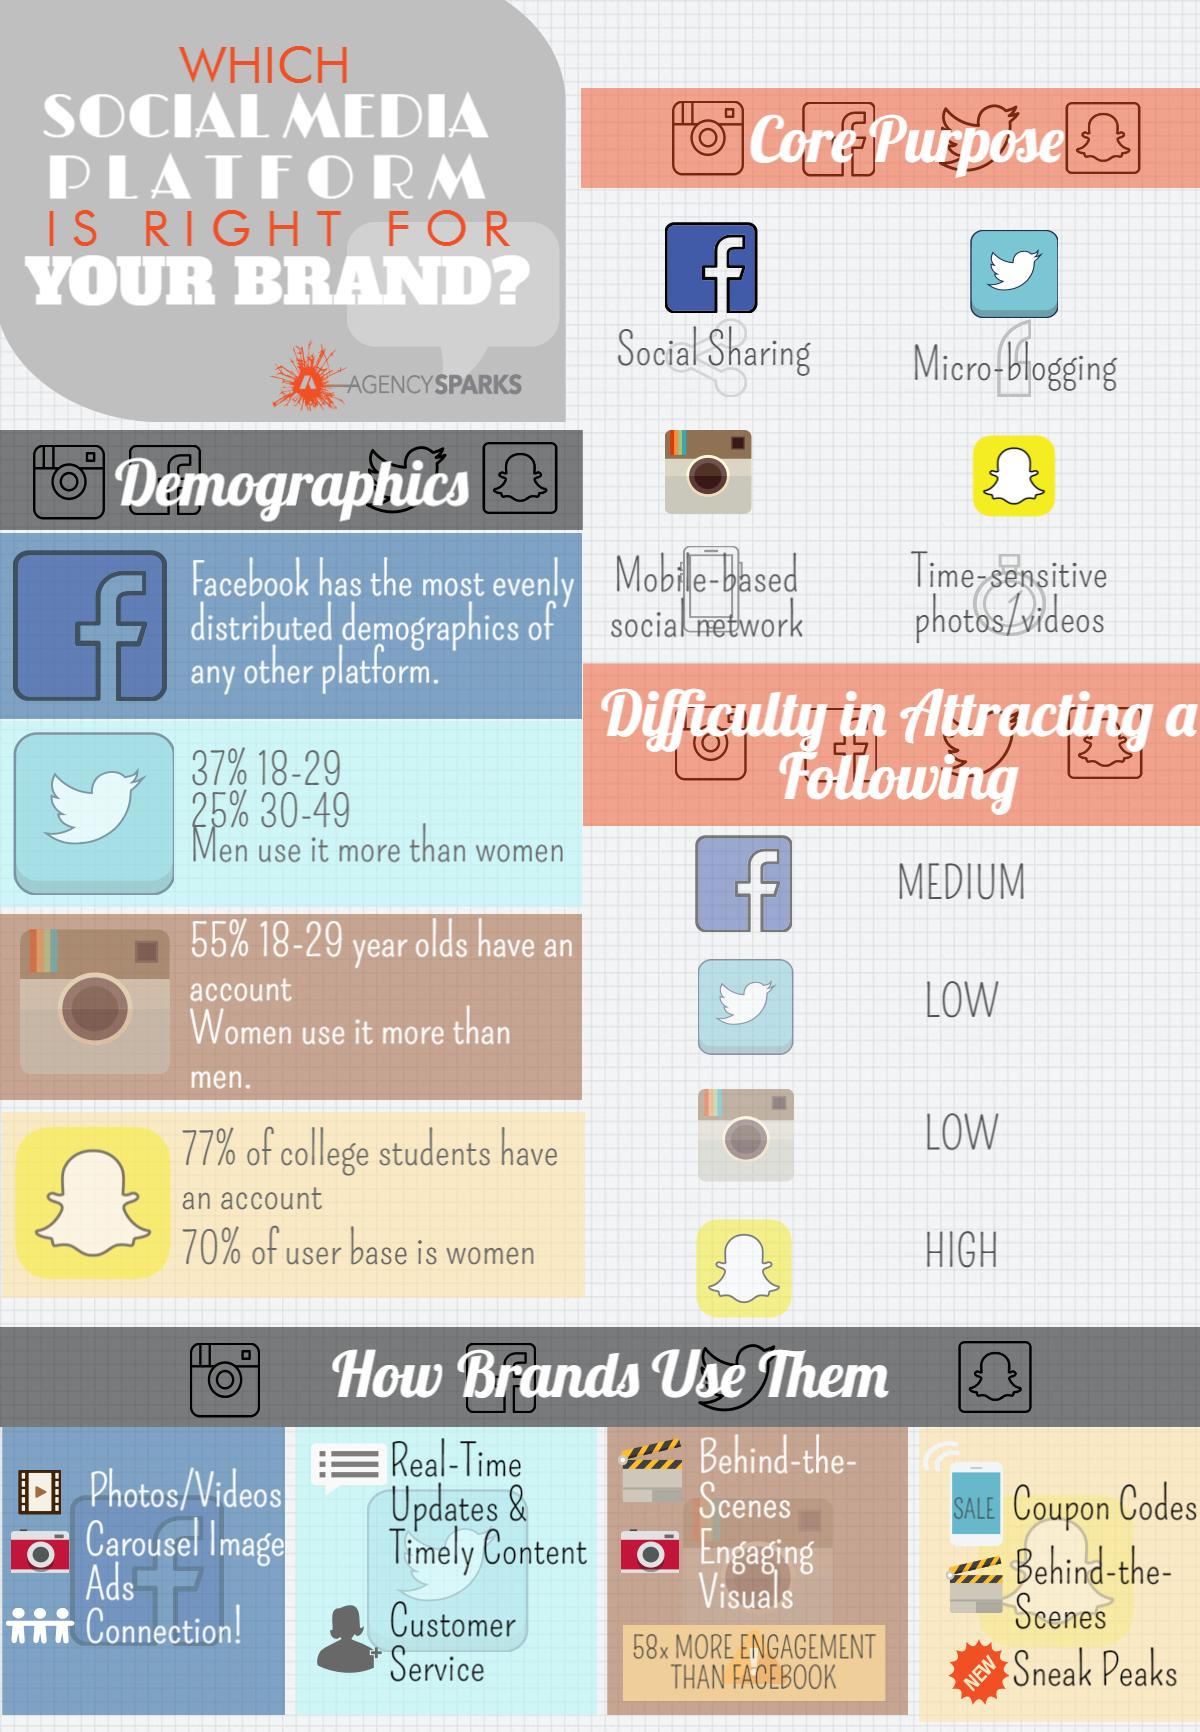 Social Media statistics and platforms.